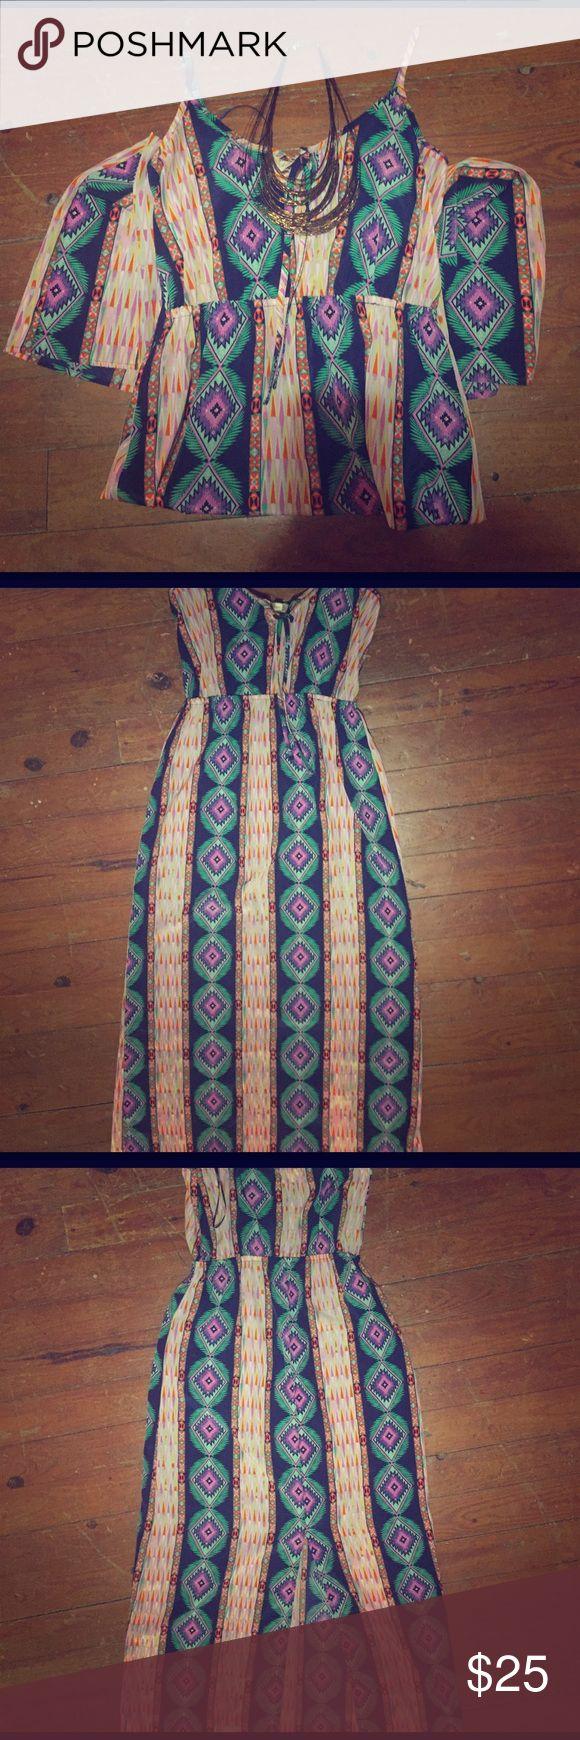 pink rose maxi dress a beautiful maxi dress multicolor spaghetti strap keyhole opening